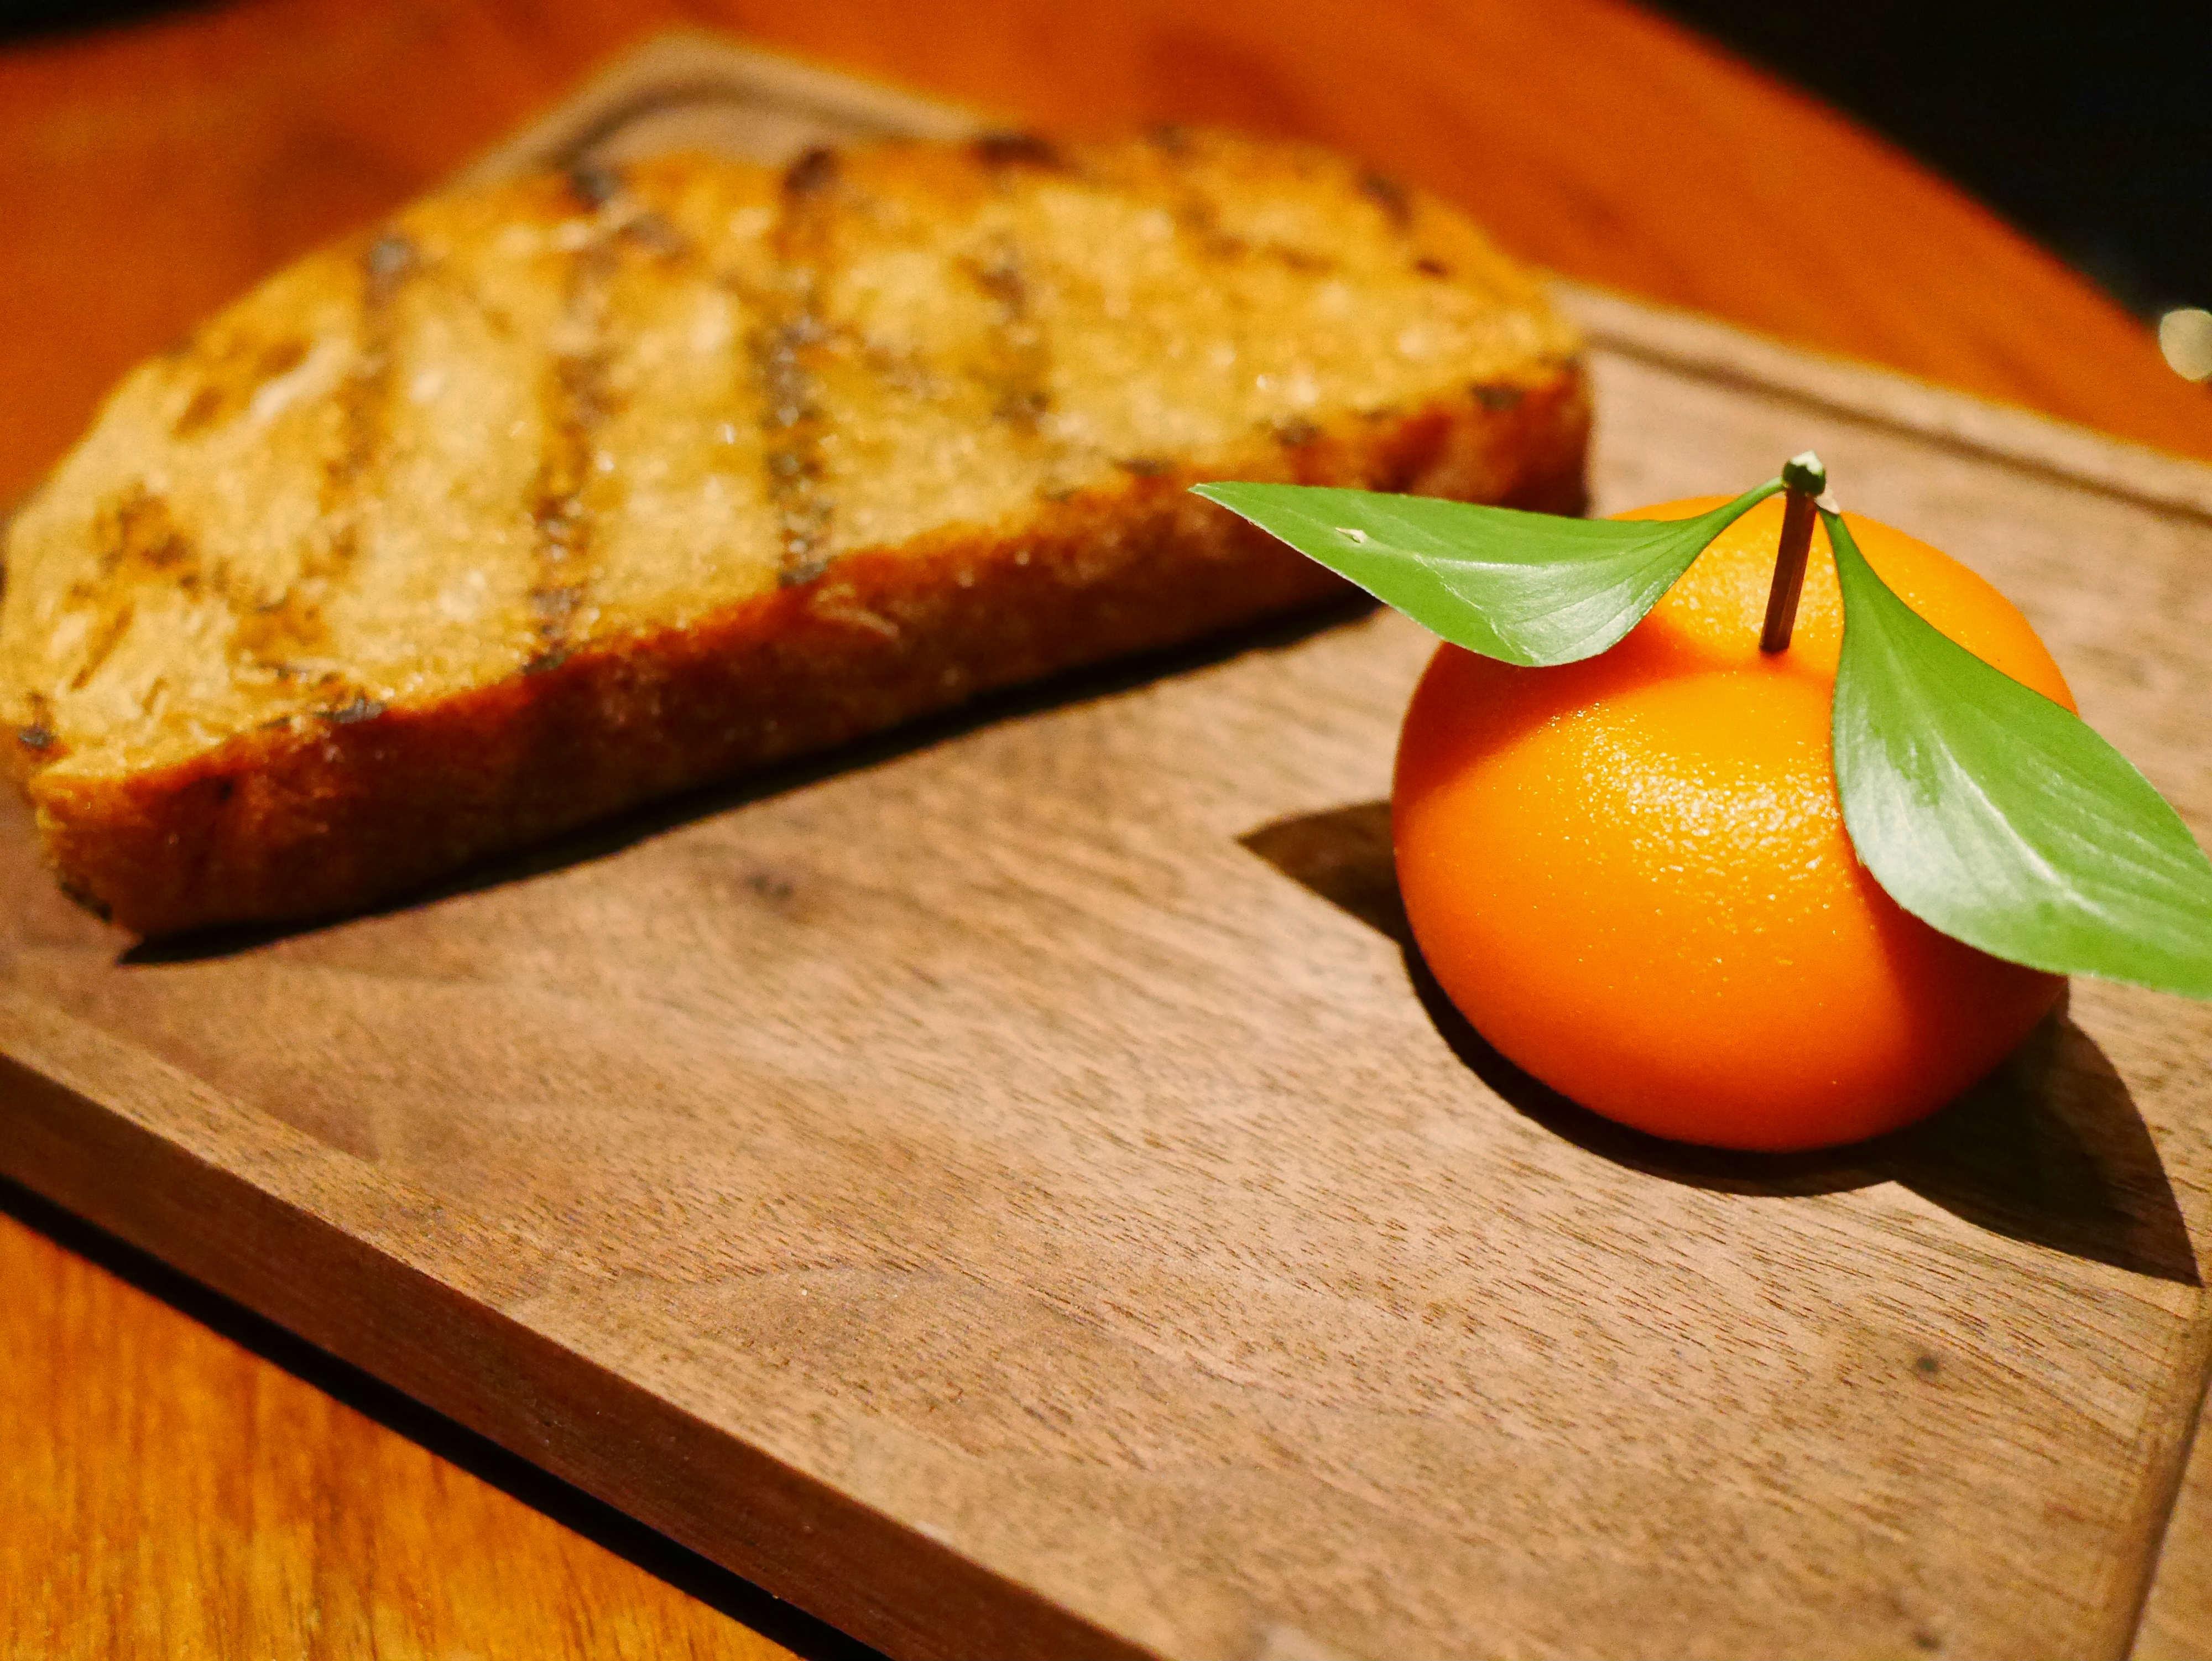 Dinner By Heston Blumenthal Melbourne • The Sweet Wanderlust | 4000 x 3003 jpeg 1051kB